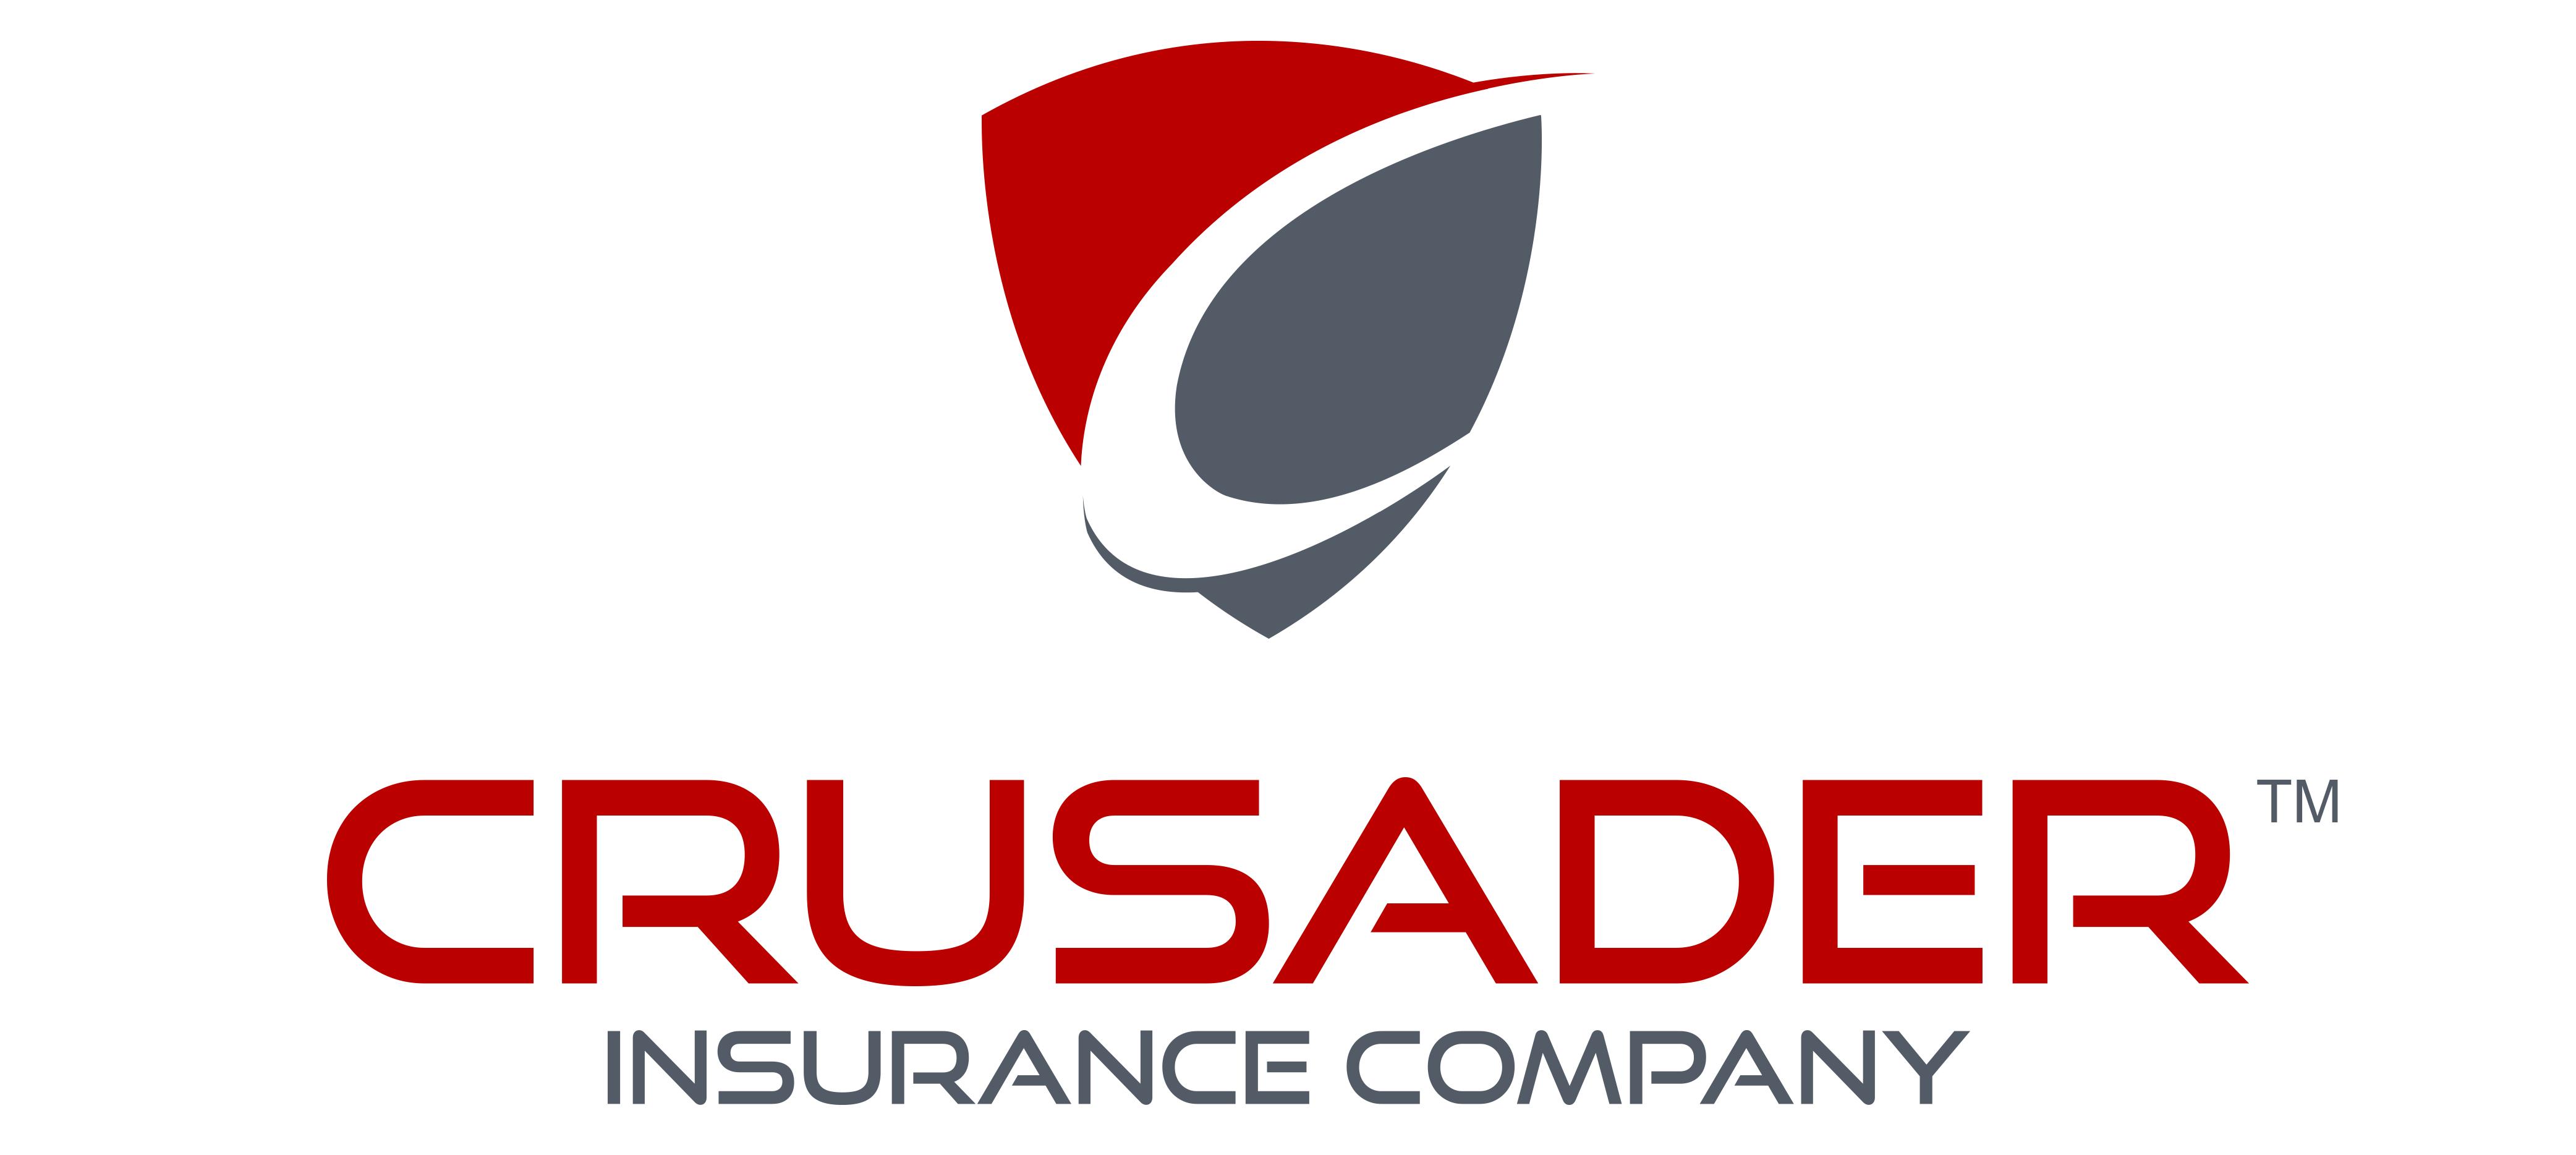 Crusader Insurance Apartment Buildings Trucking